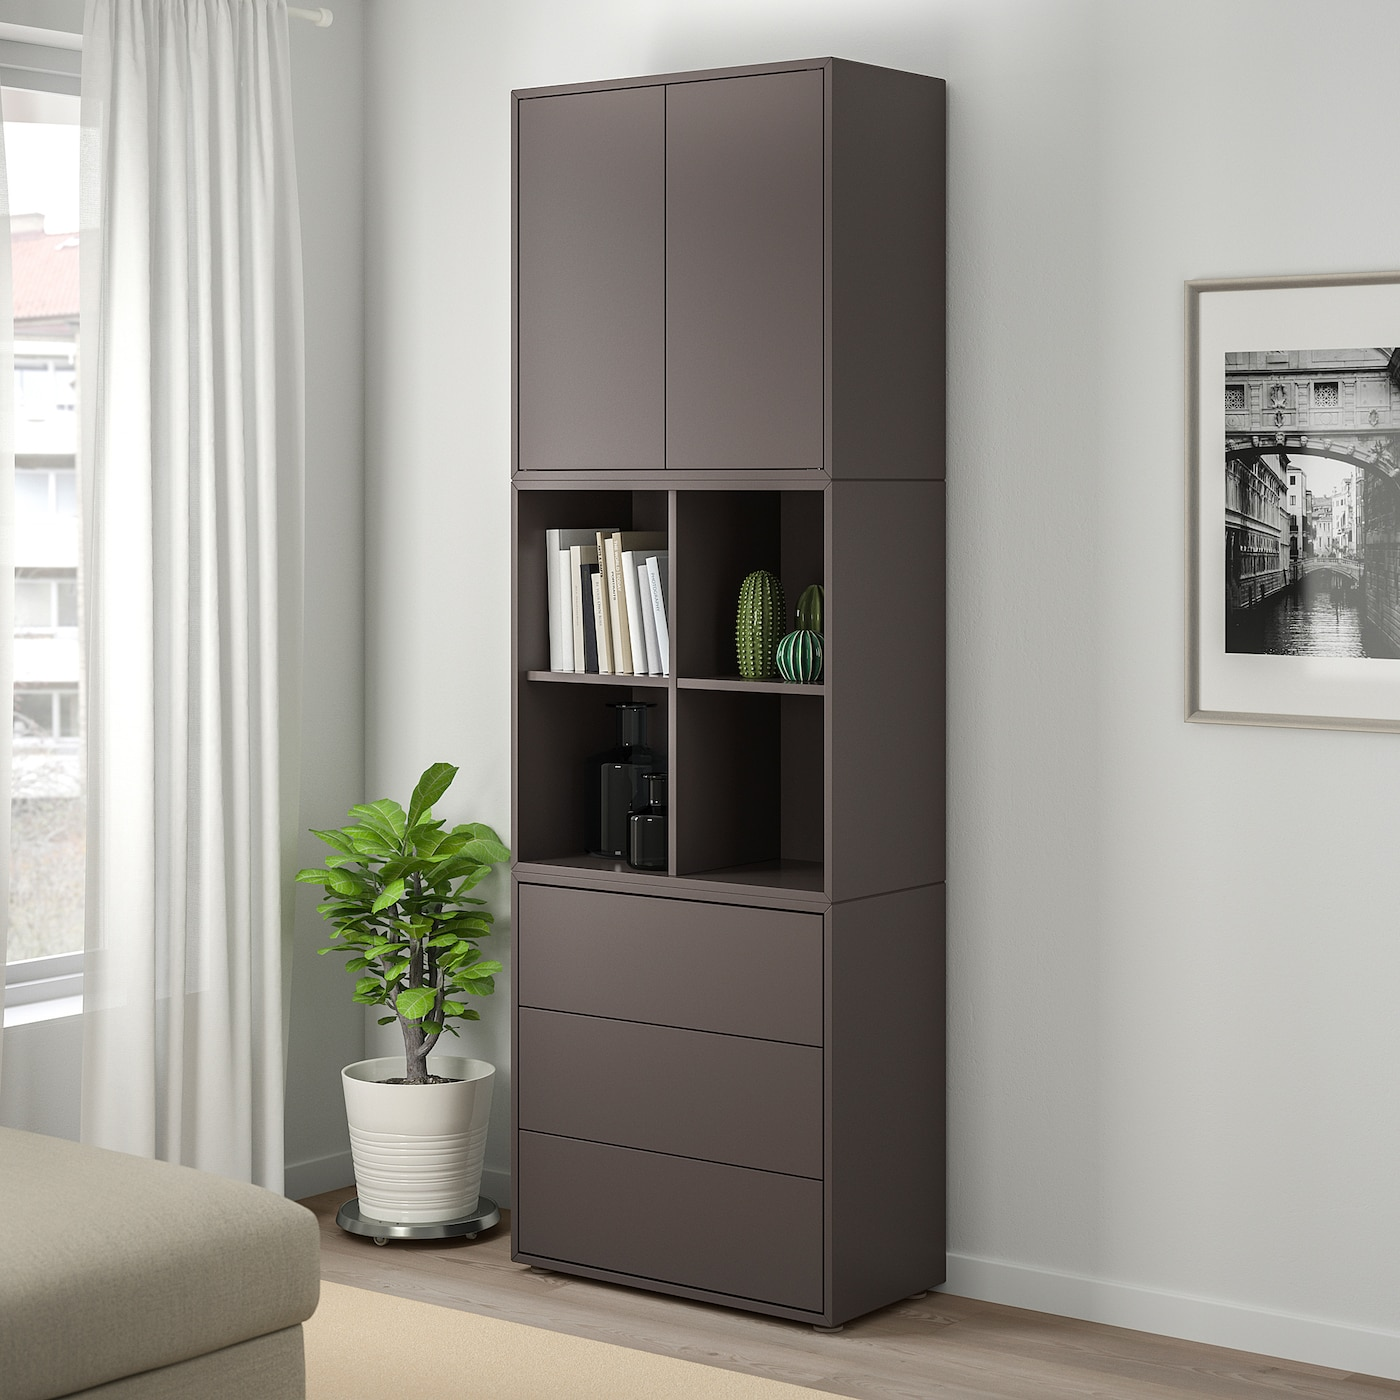 EKET Cabinet combination with feet, dark grey, 70x35x212 cm